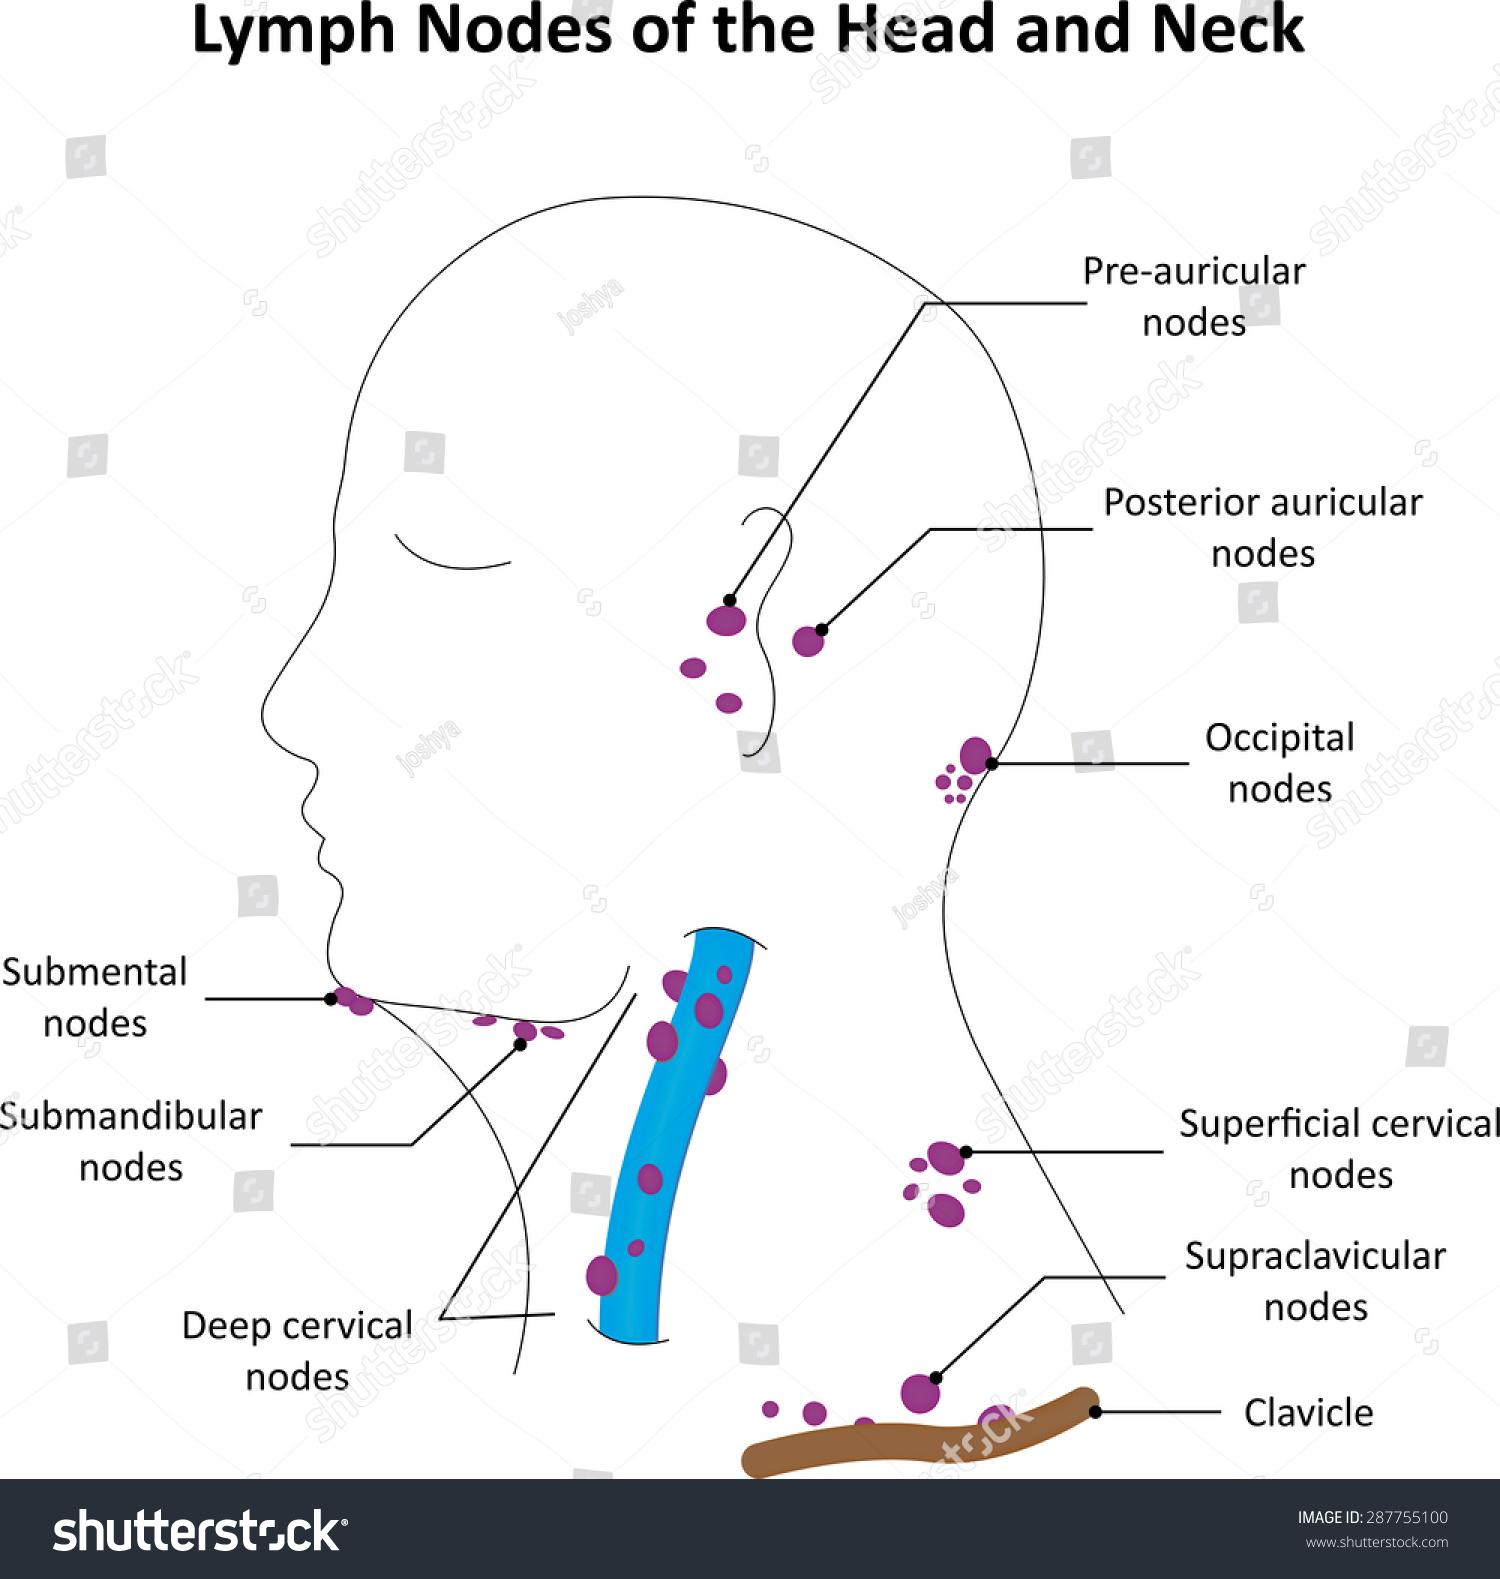 hight resolution of lymph nodes head neck labelled diagram stock illustration 287755100 diagram of lymph nodes back of head diagram of lymph nodes head